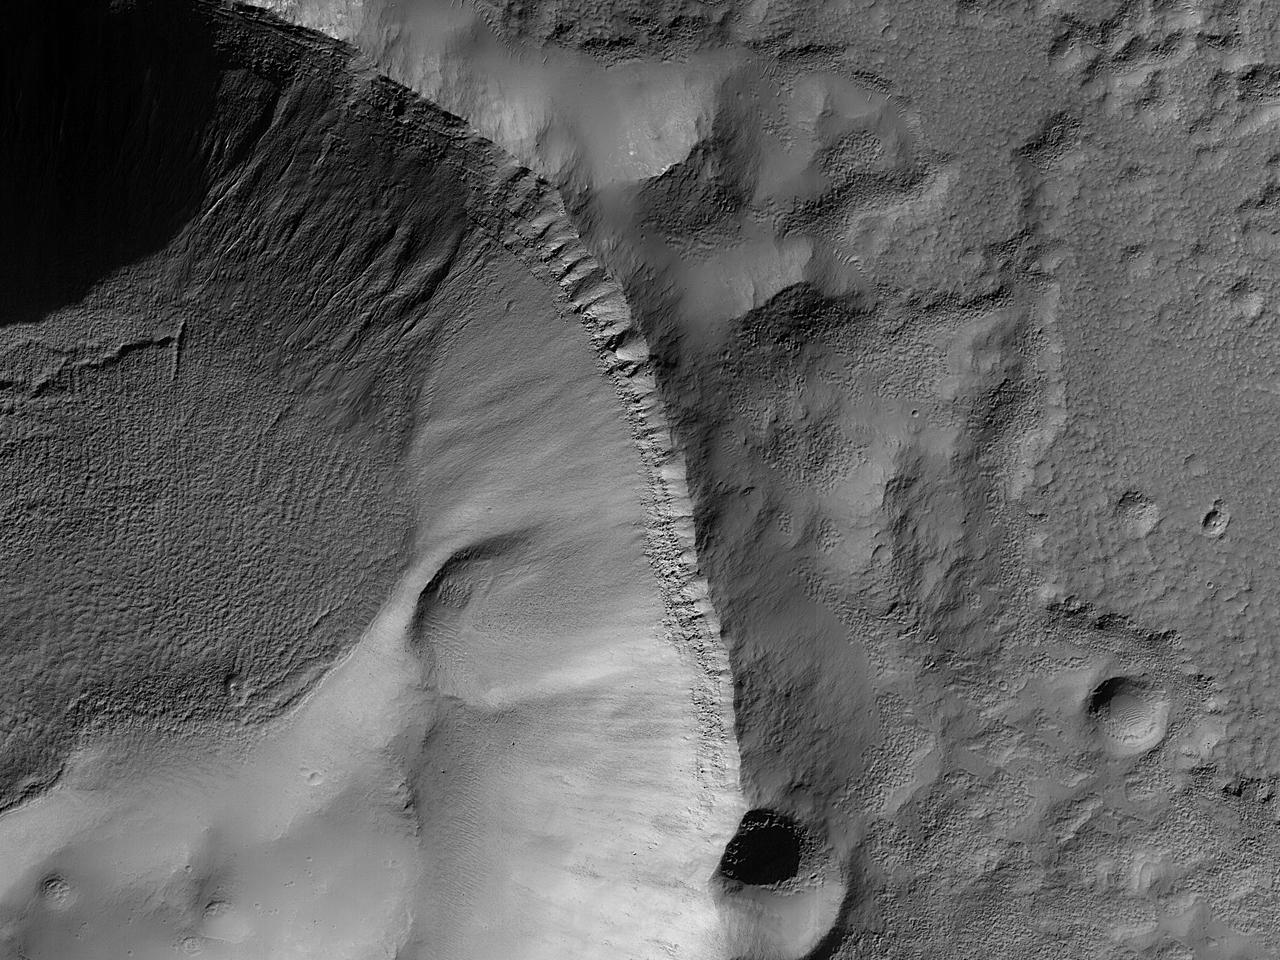 Skygger på en kratervegg